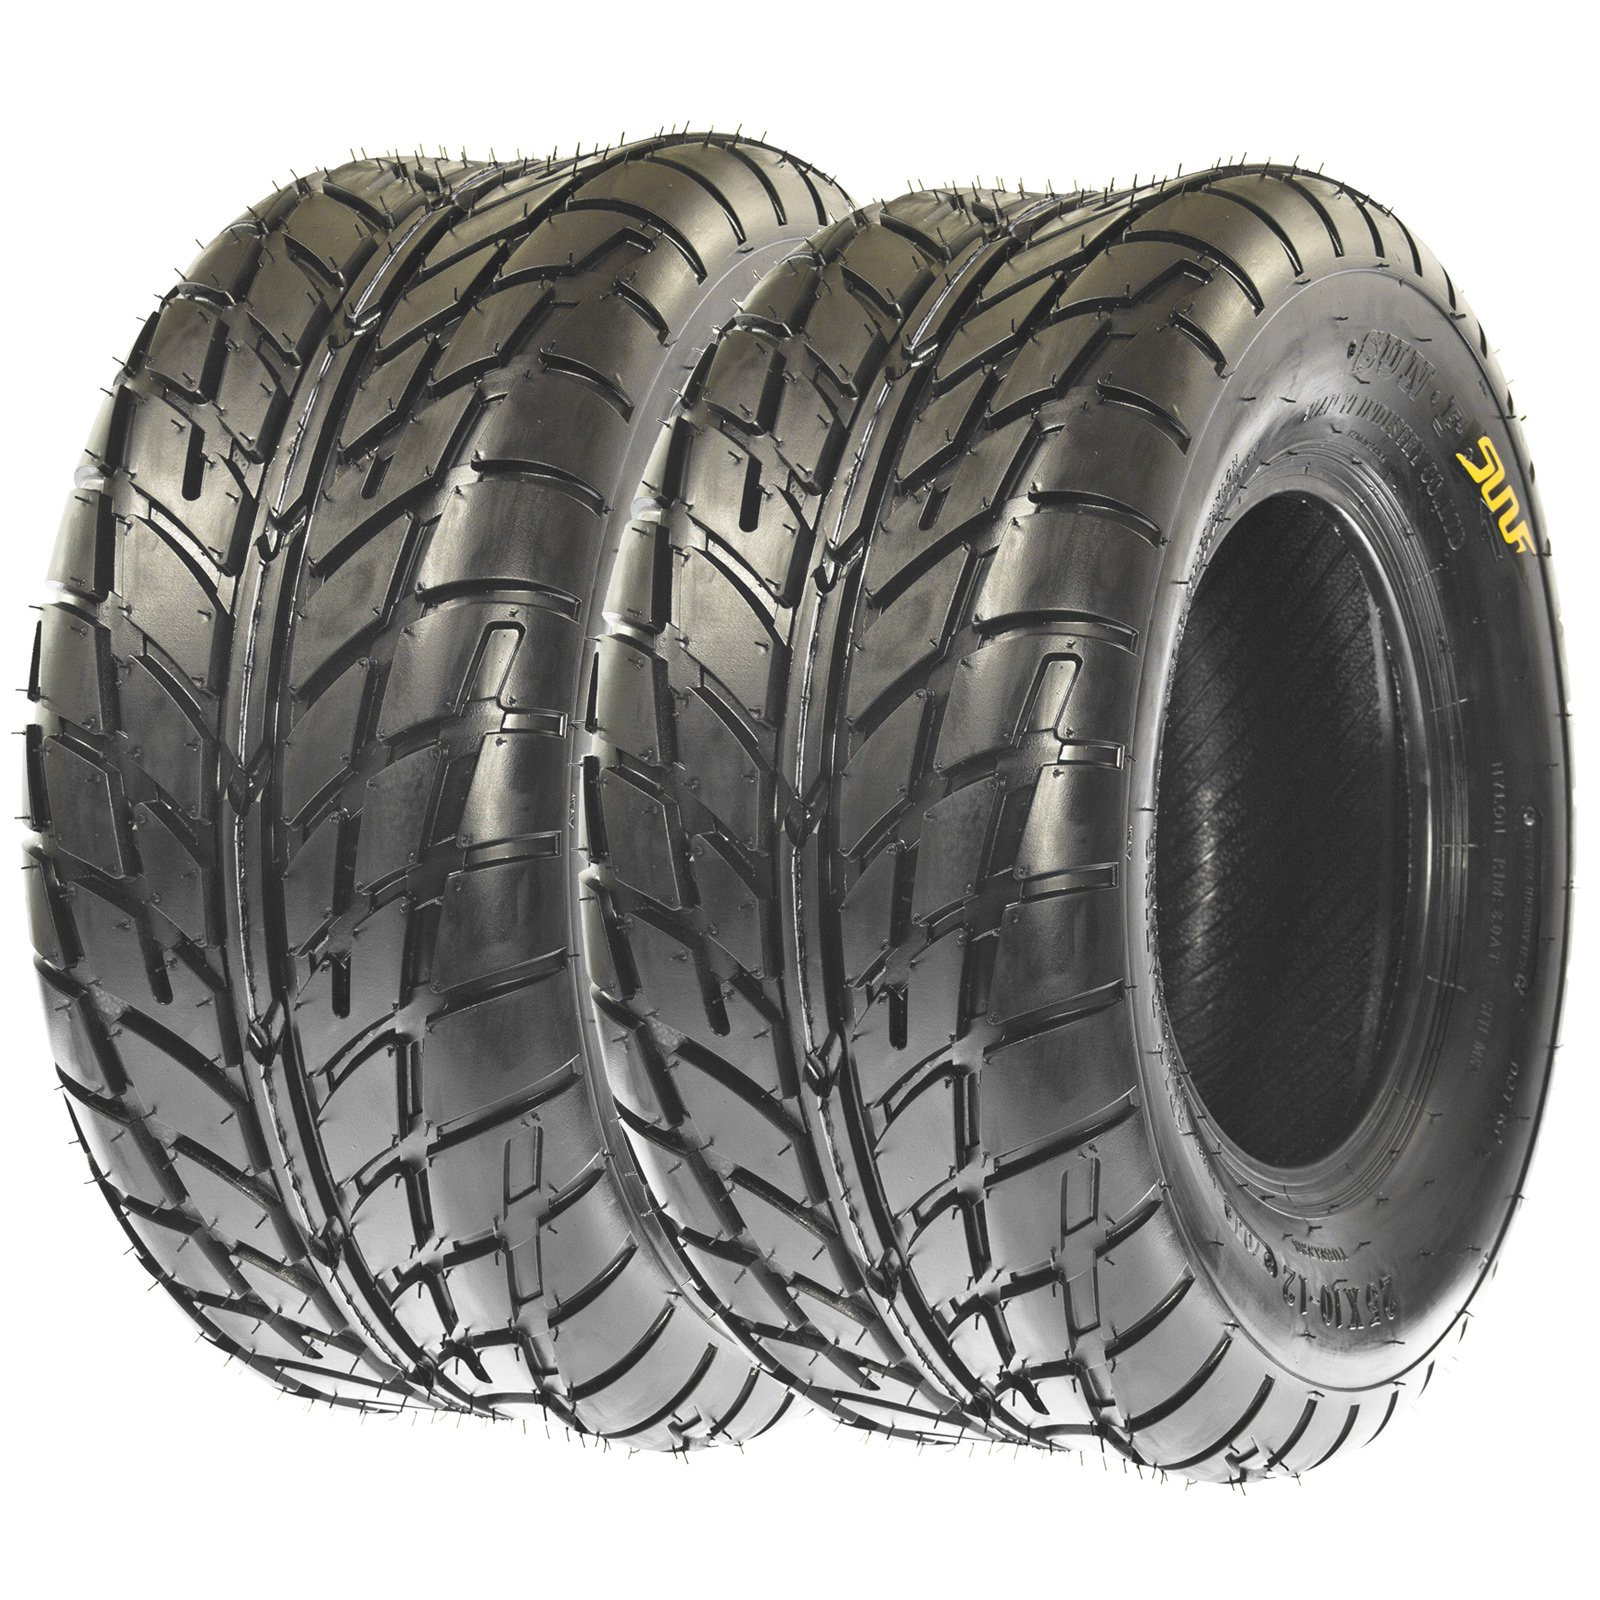 SunF Sport Quad ATV UTV Road Tires 26x10-14 26x10x14 6 PR A021 (Set pair of 2)